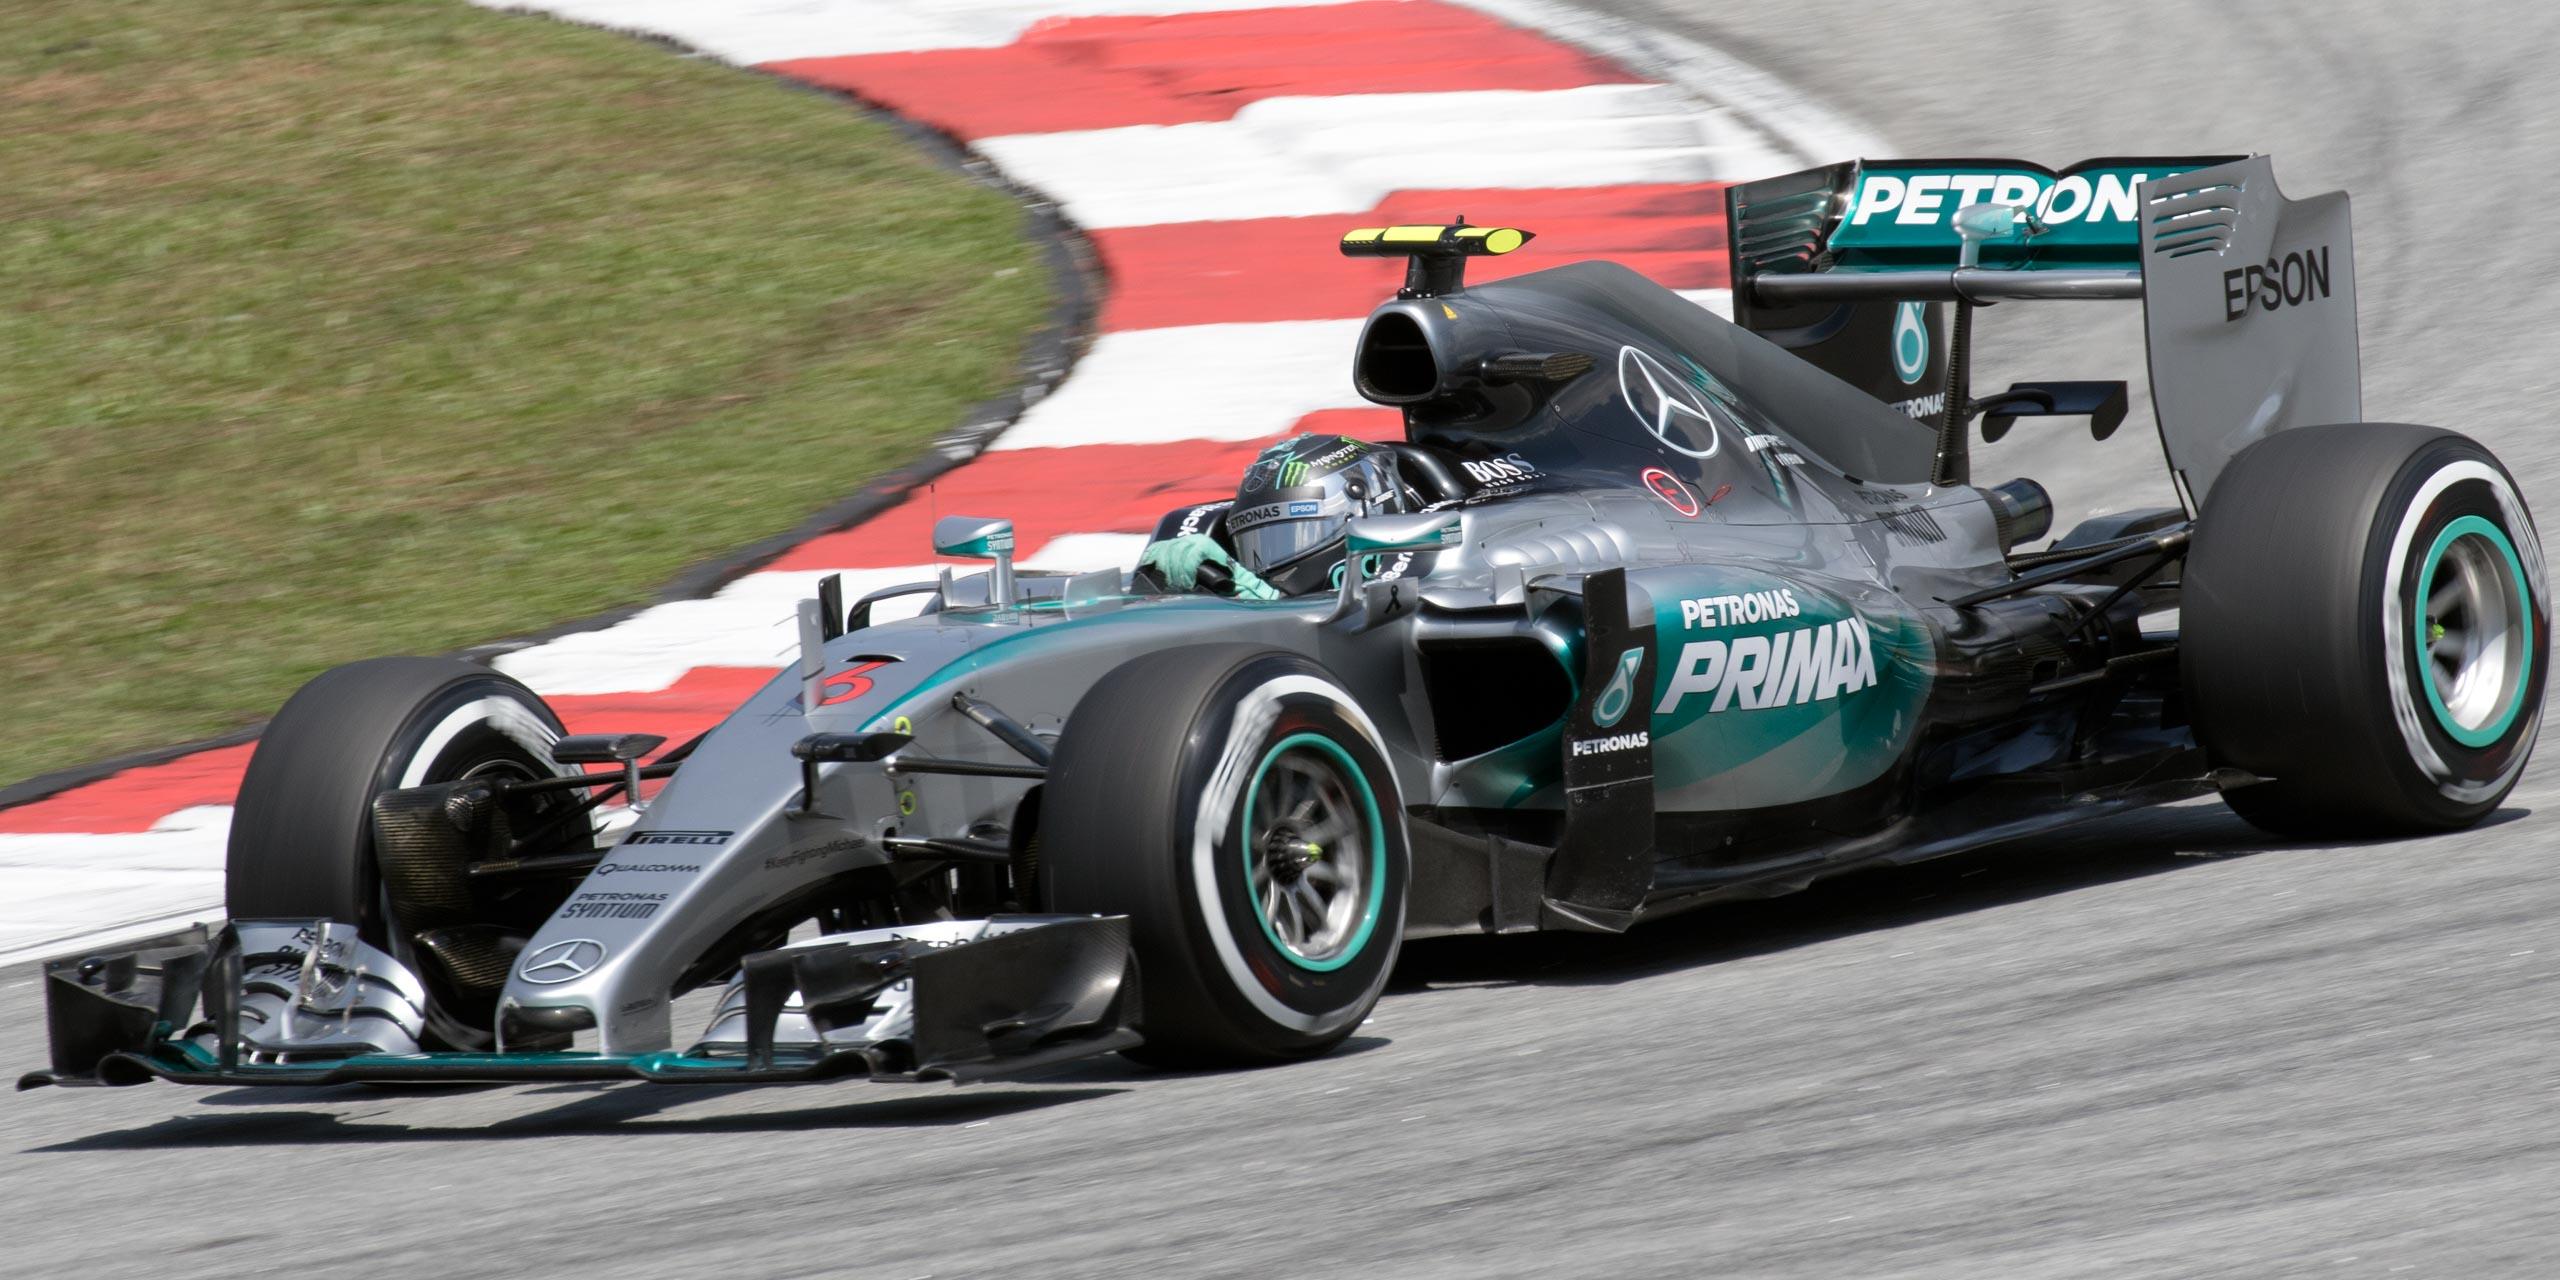 Mercedes Formula 1 (wikipedia.org)